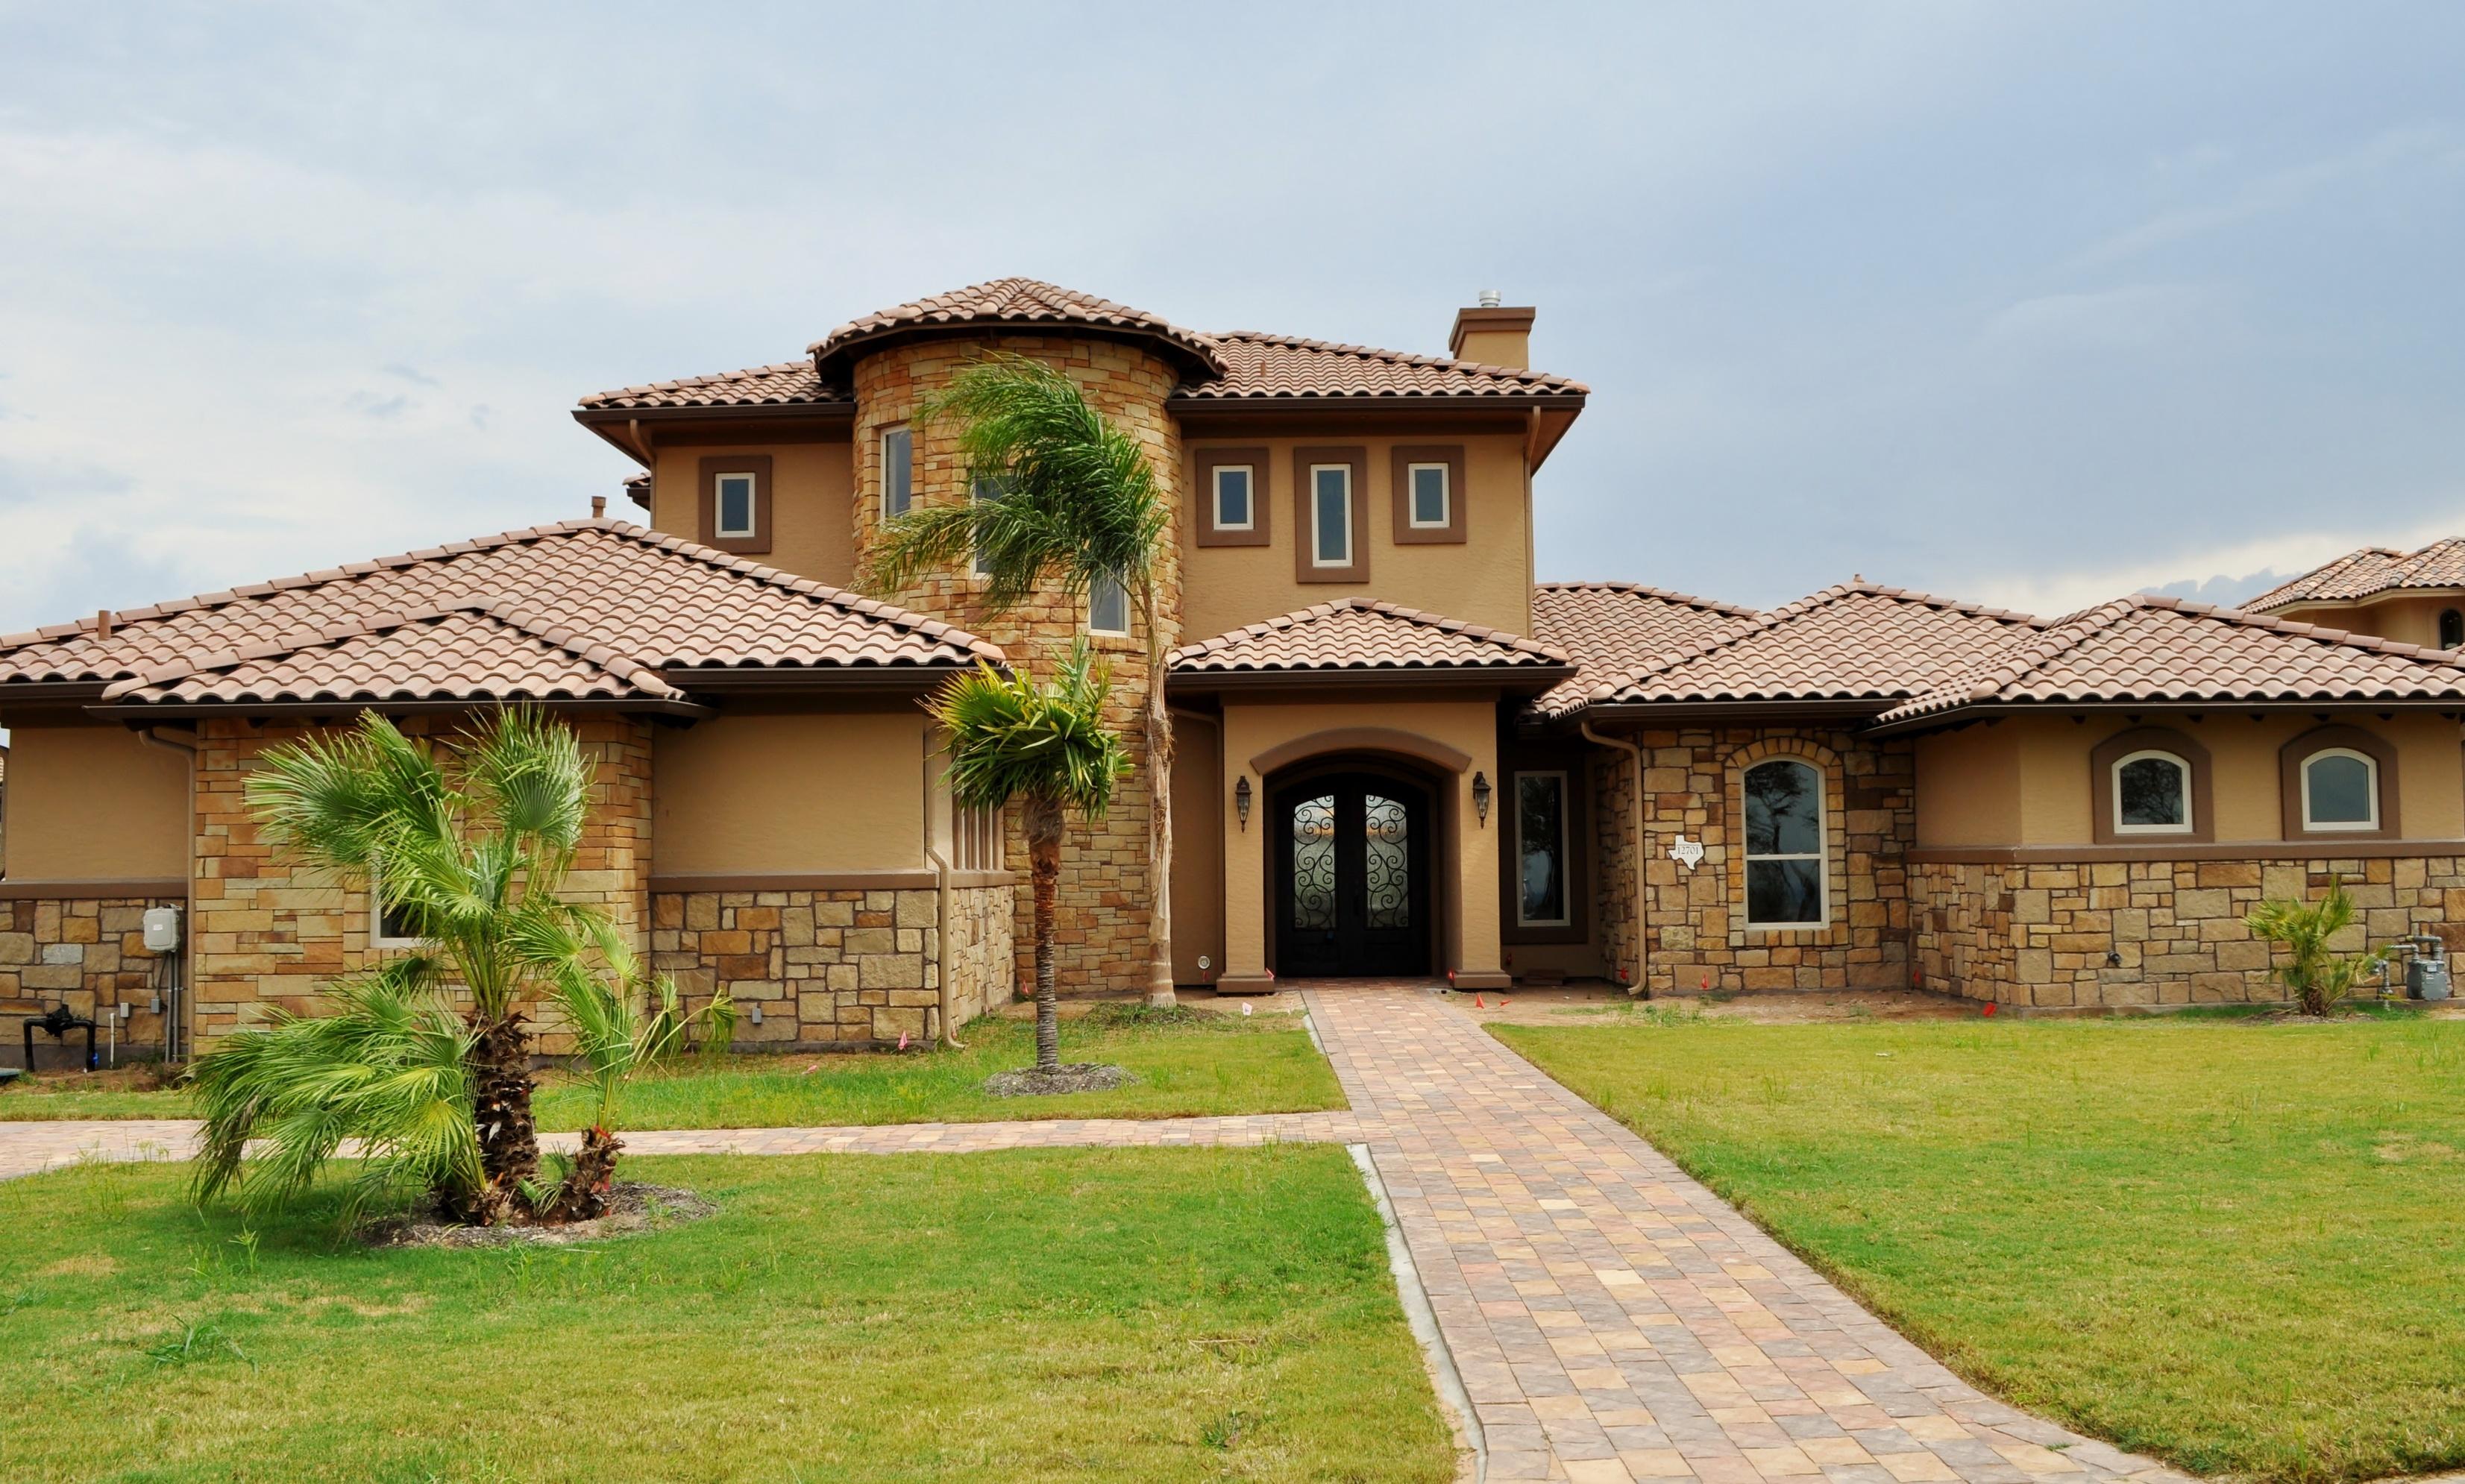 Photos texas usa cities houses 3305x1990 for Home plans usa